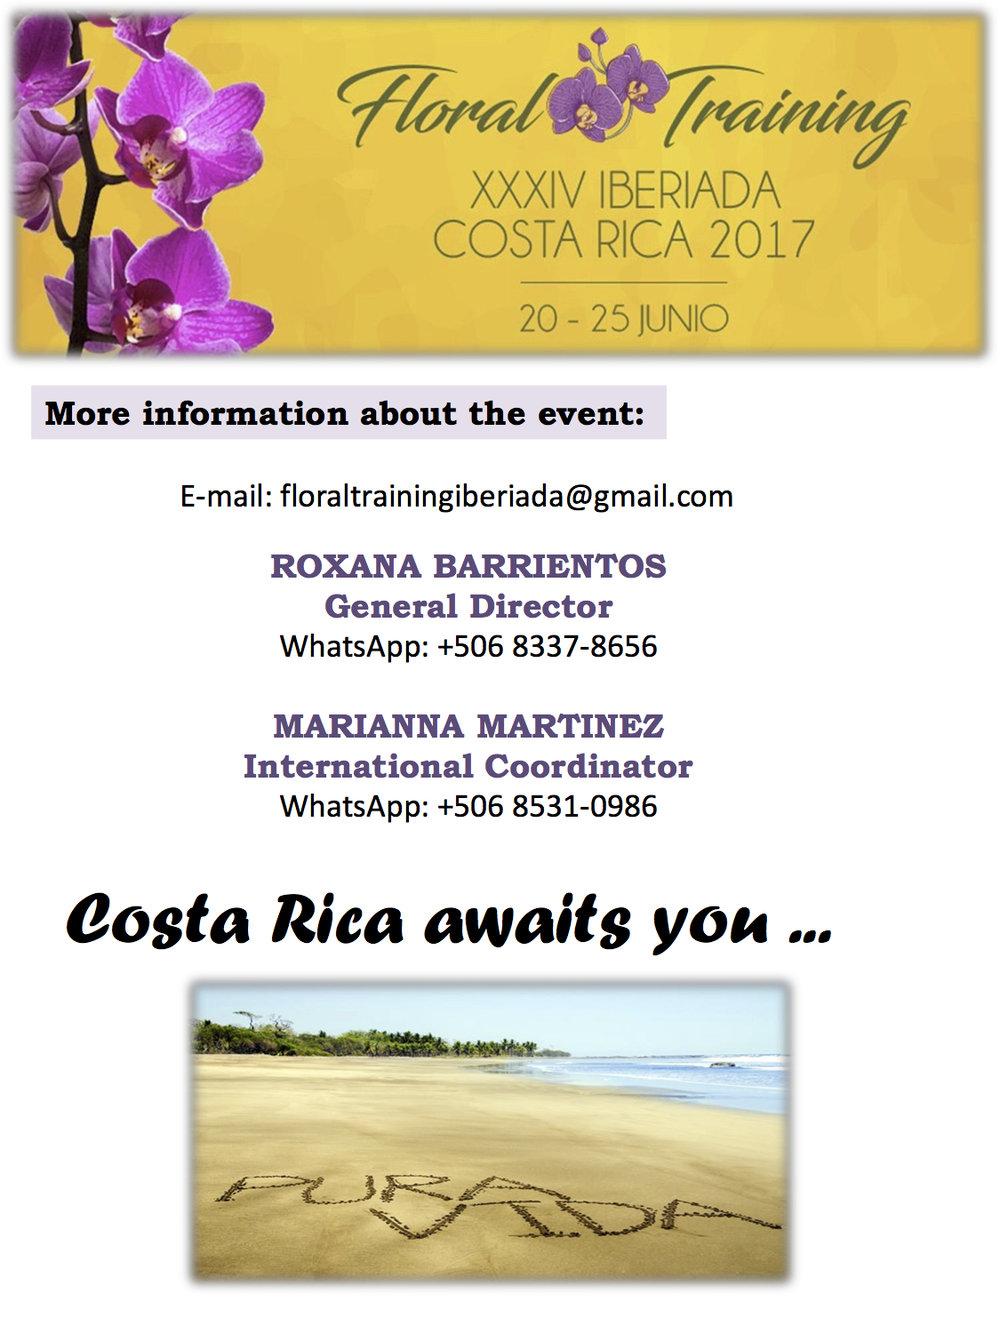 Floral Training - XXXIV Iberiada Costa Rica 2017 (English) 12.jpg